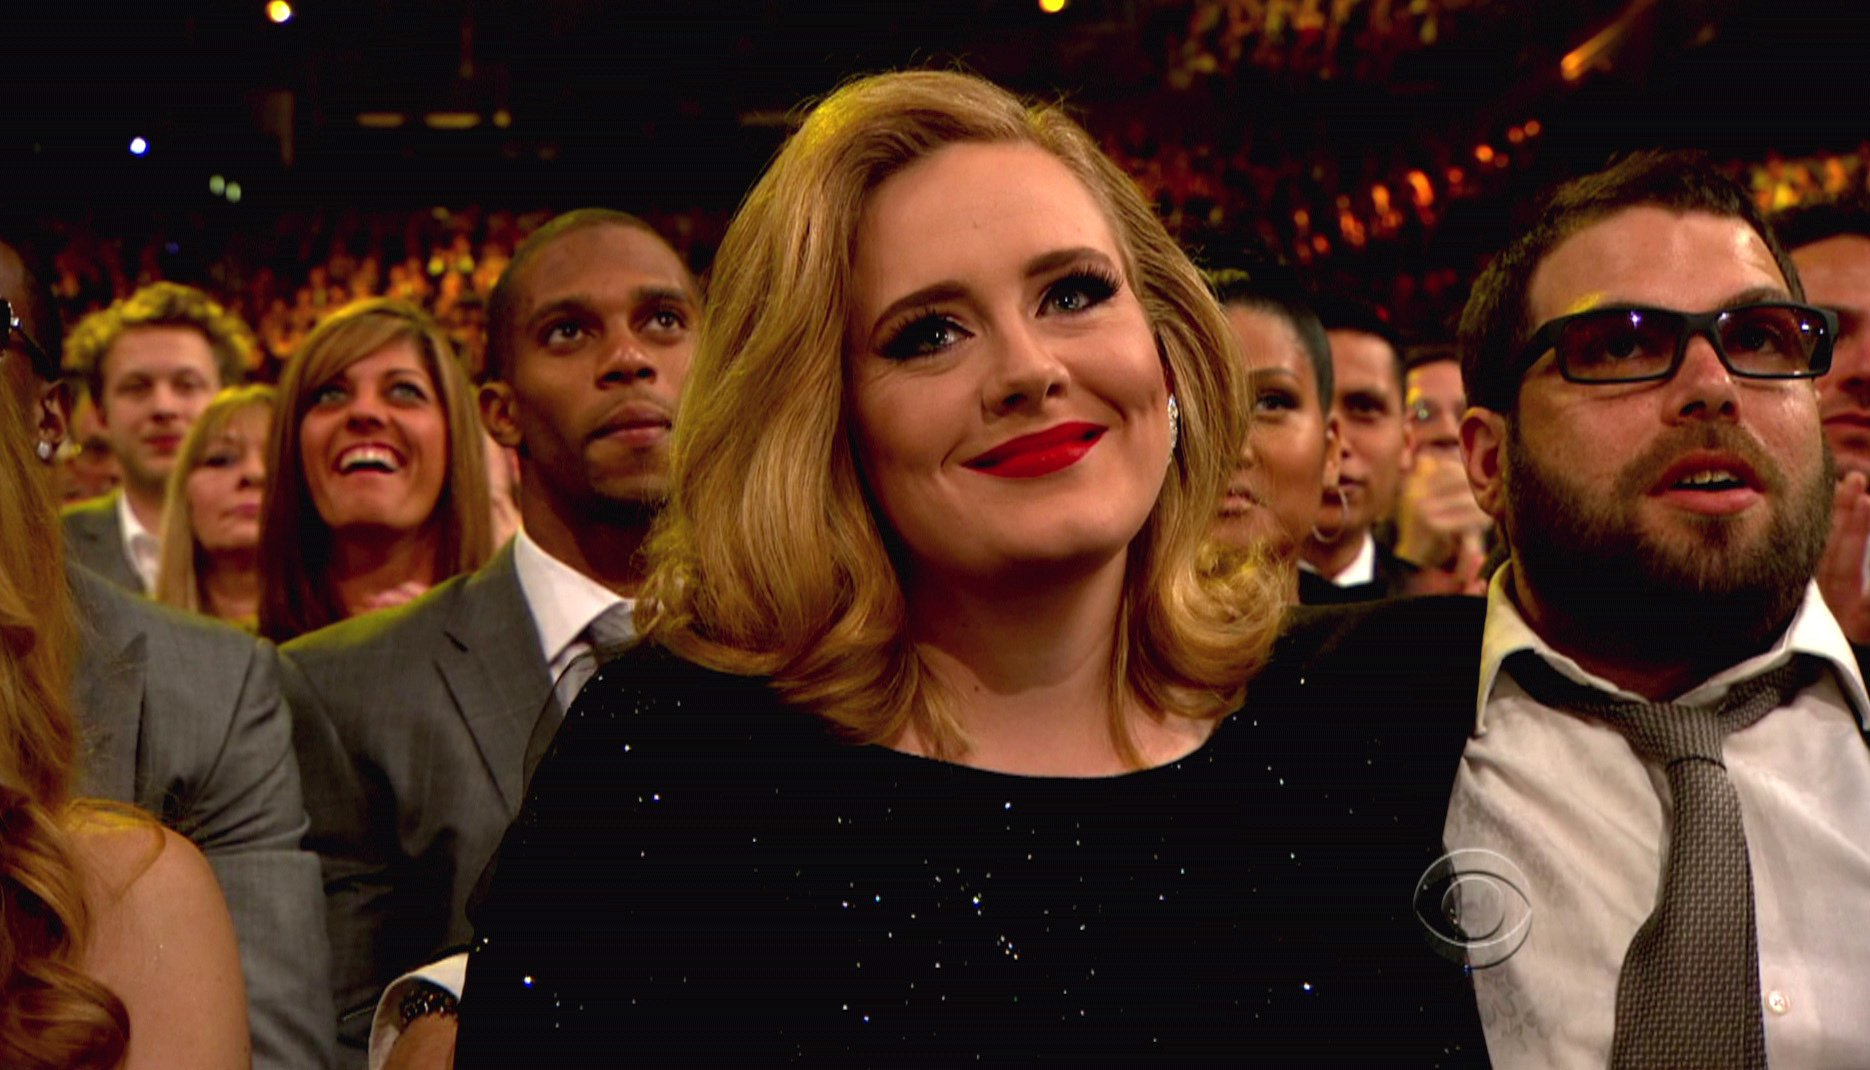 Adele and estranged husband Simon Konecki have been 'living separate lives for some time'